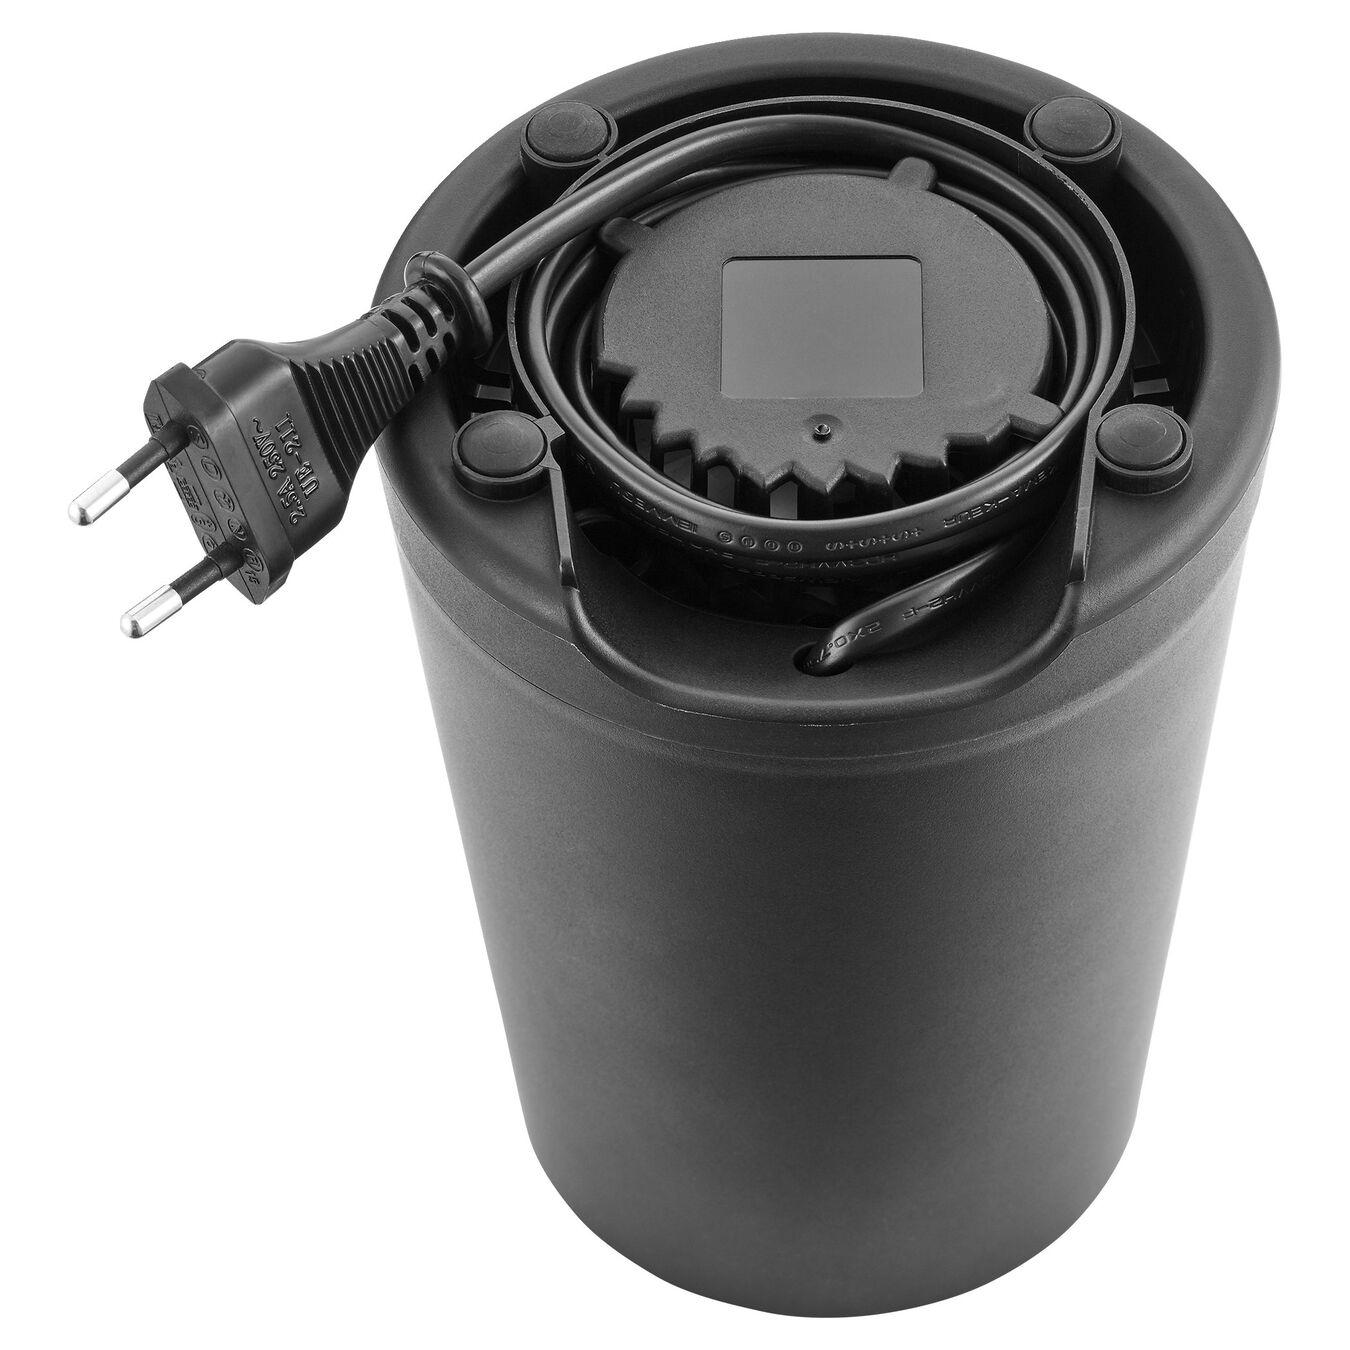 Standmixer, AC Motor, Schwarz,,large 9